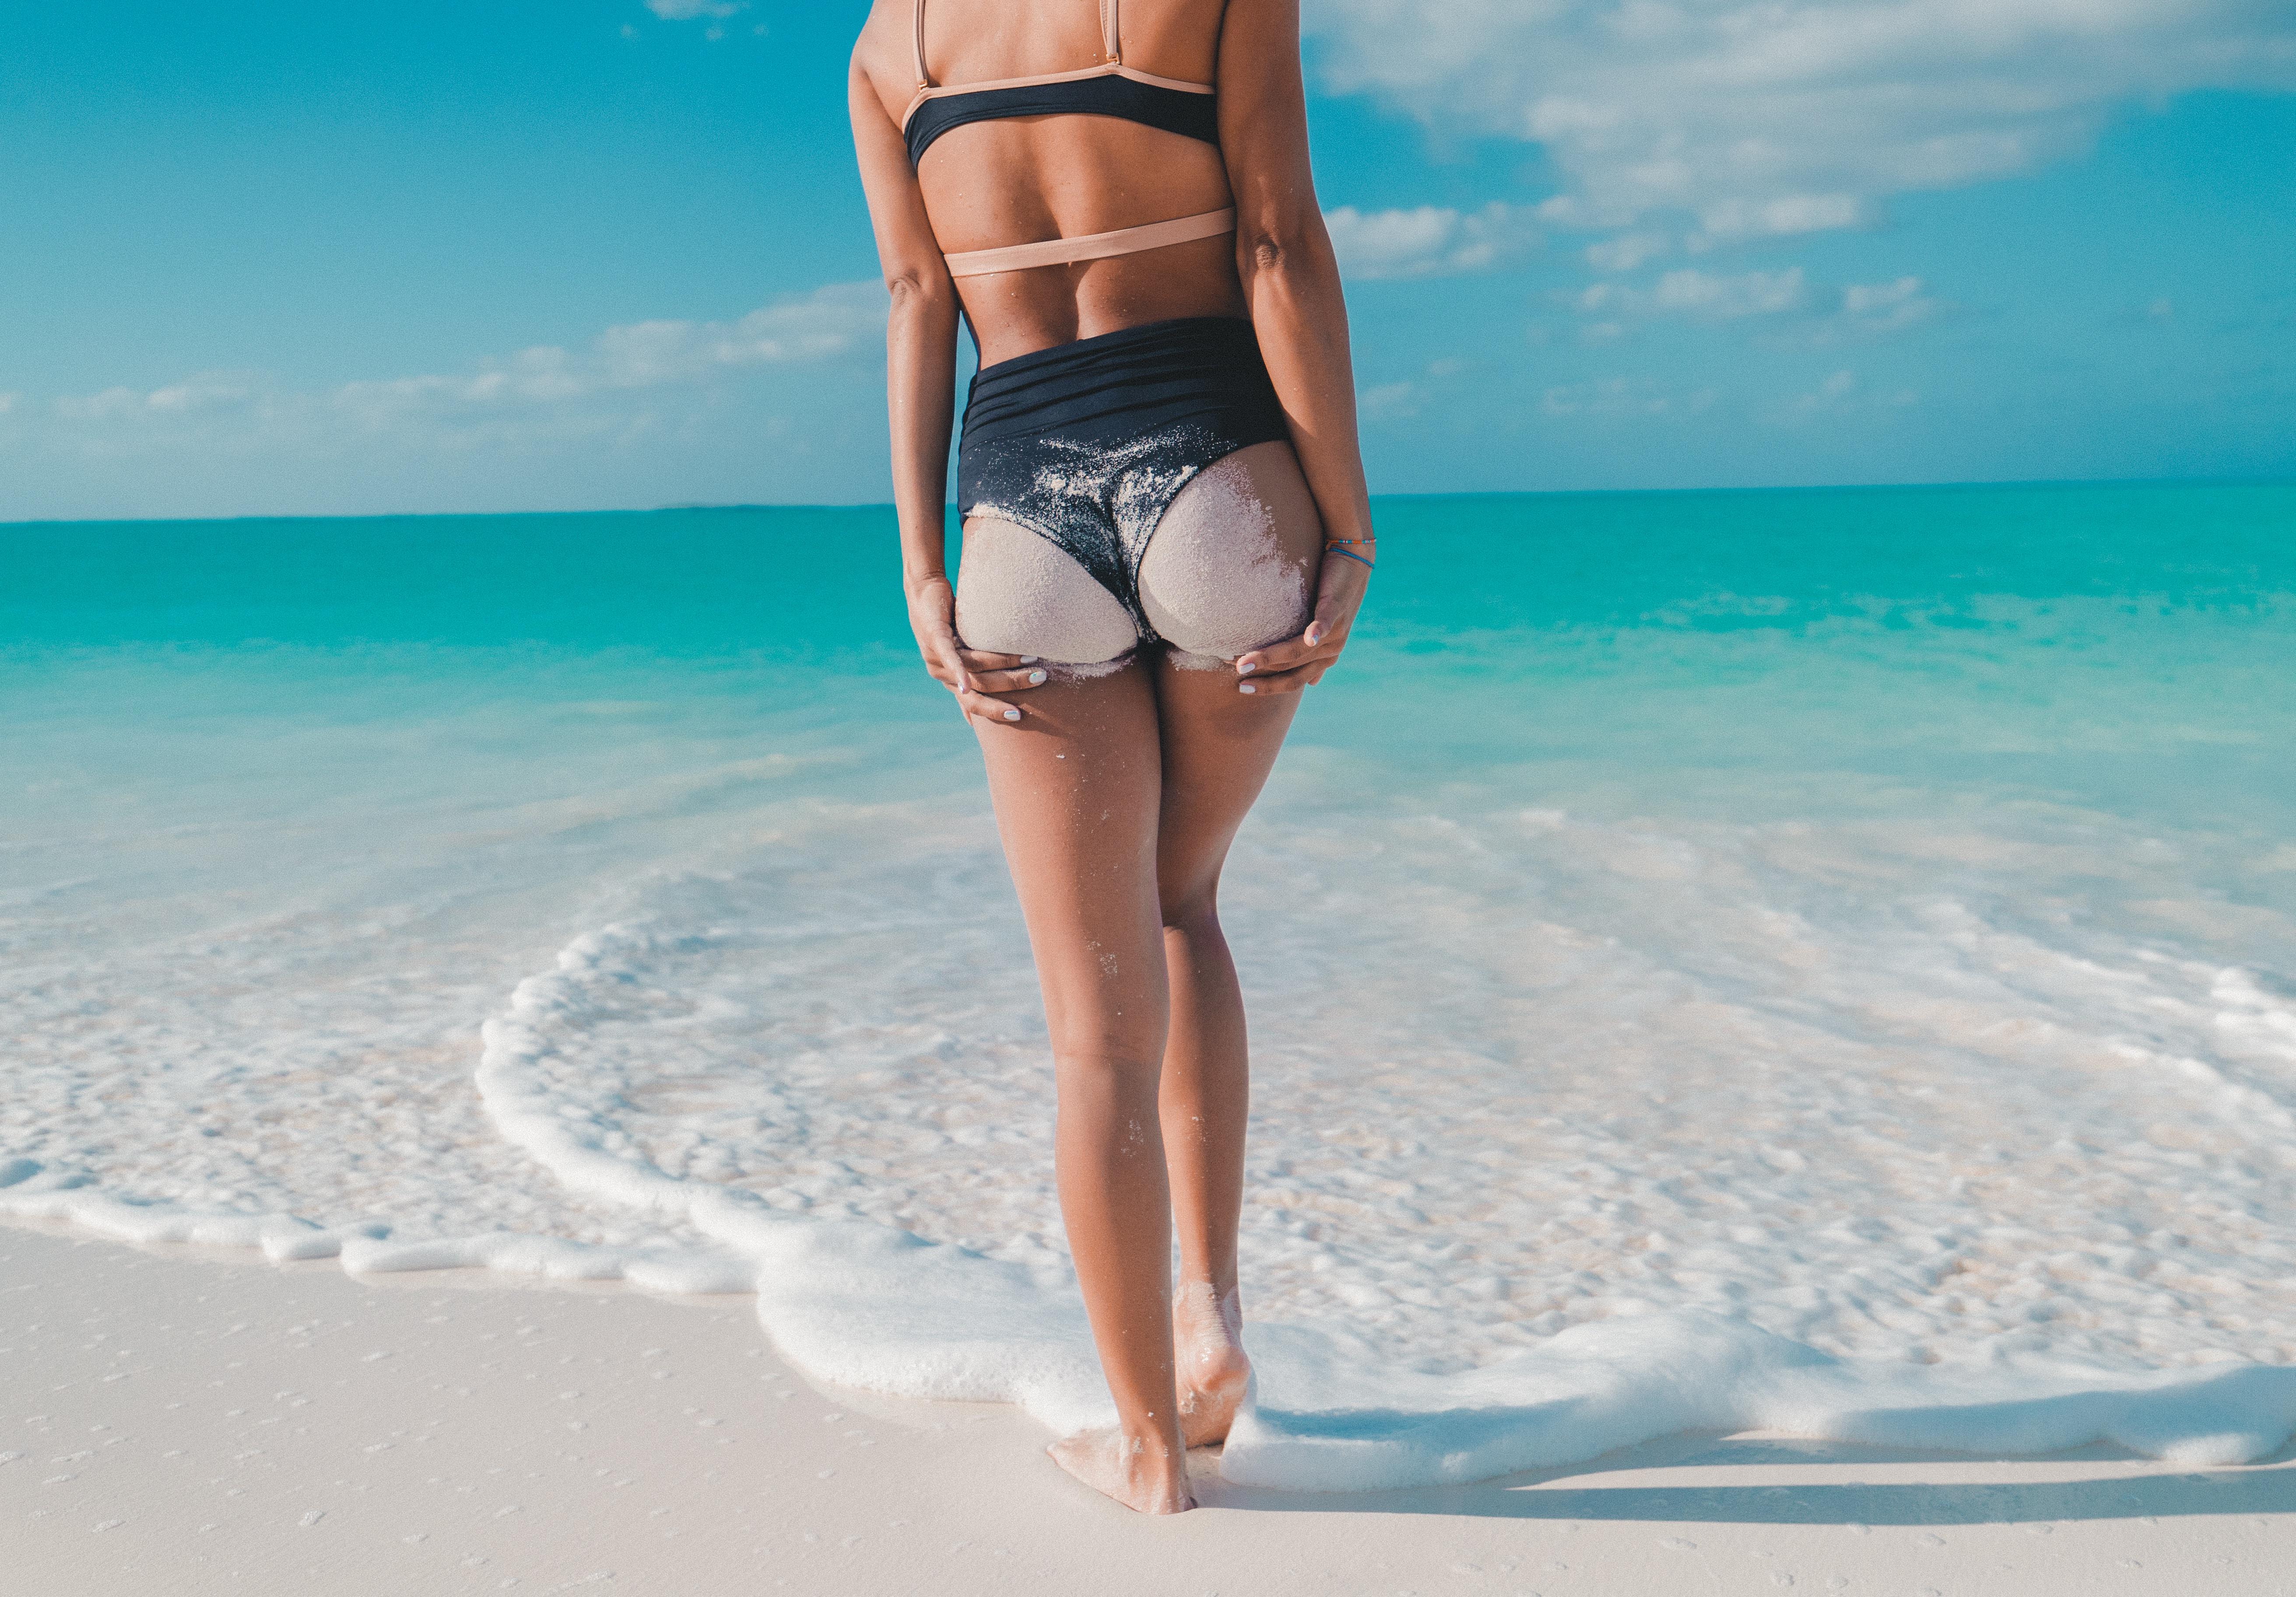 жопа на выворот на пляже